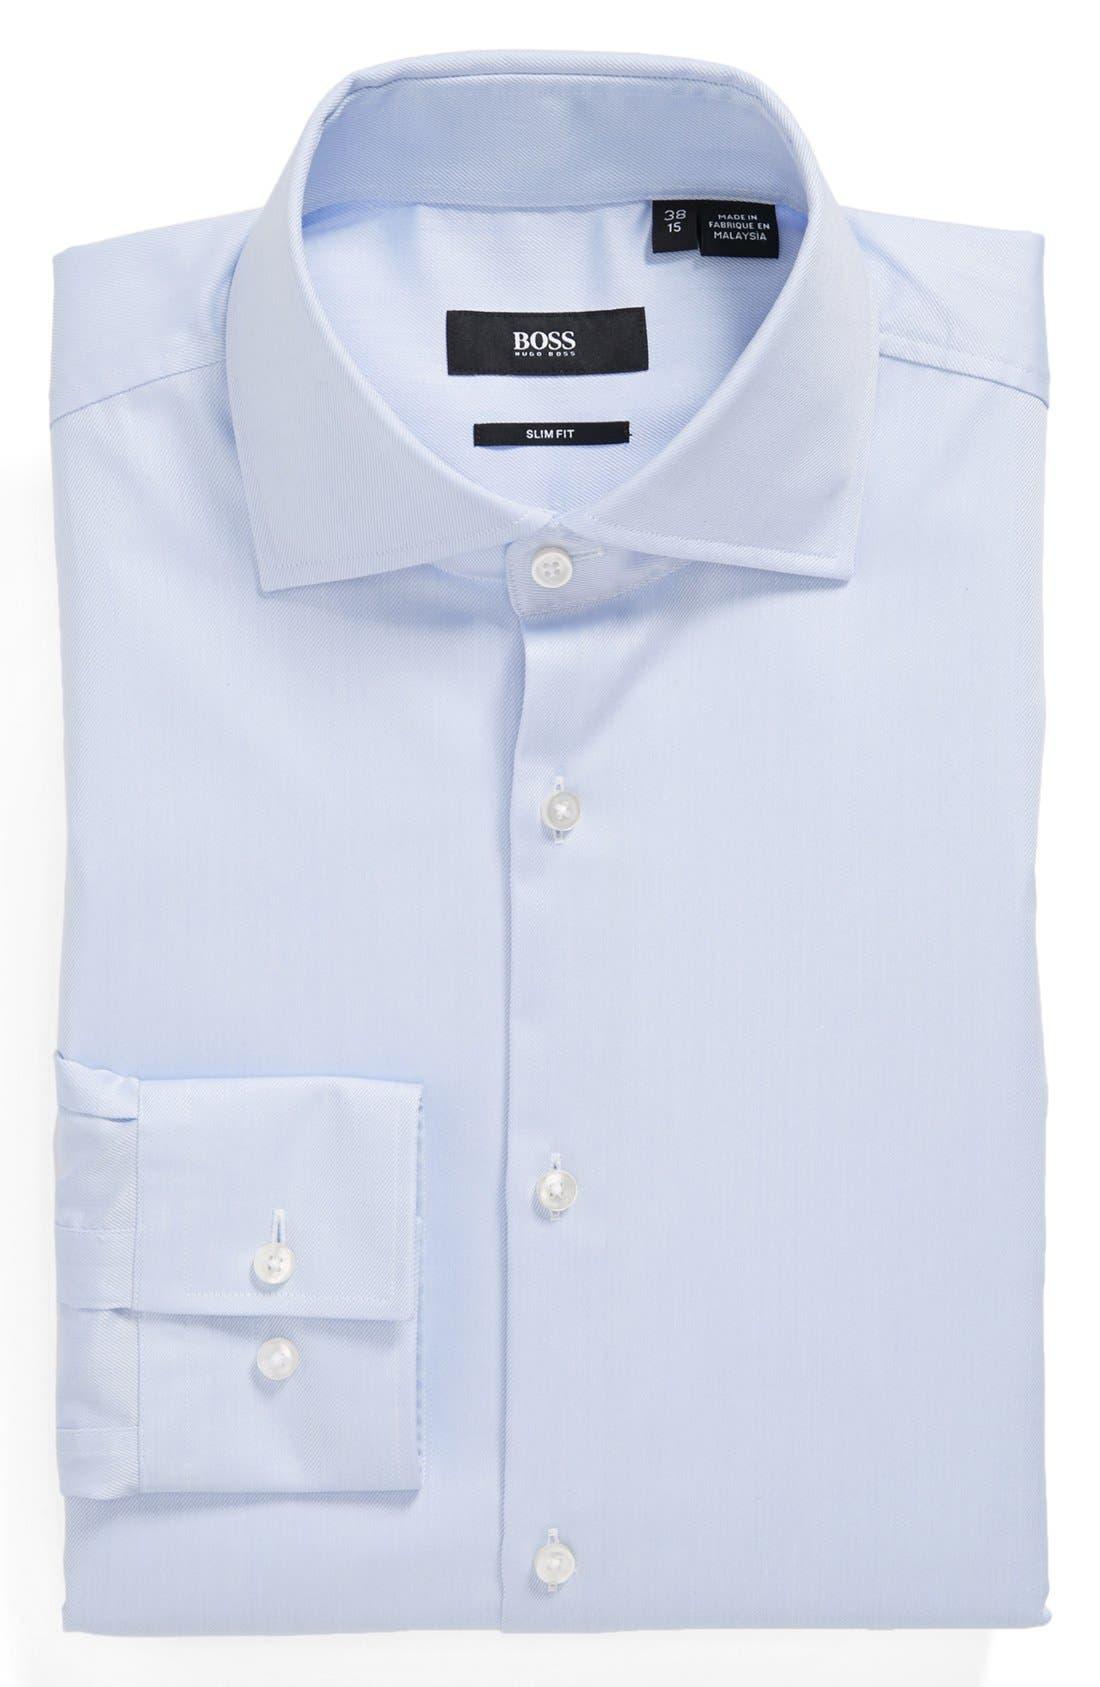 Main Image - BOSS HUGO BOSS 'Jaron' Easy Iron Slim Fit Dress Shirt